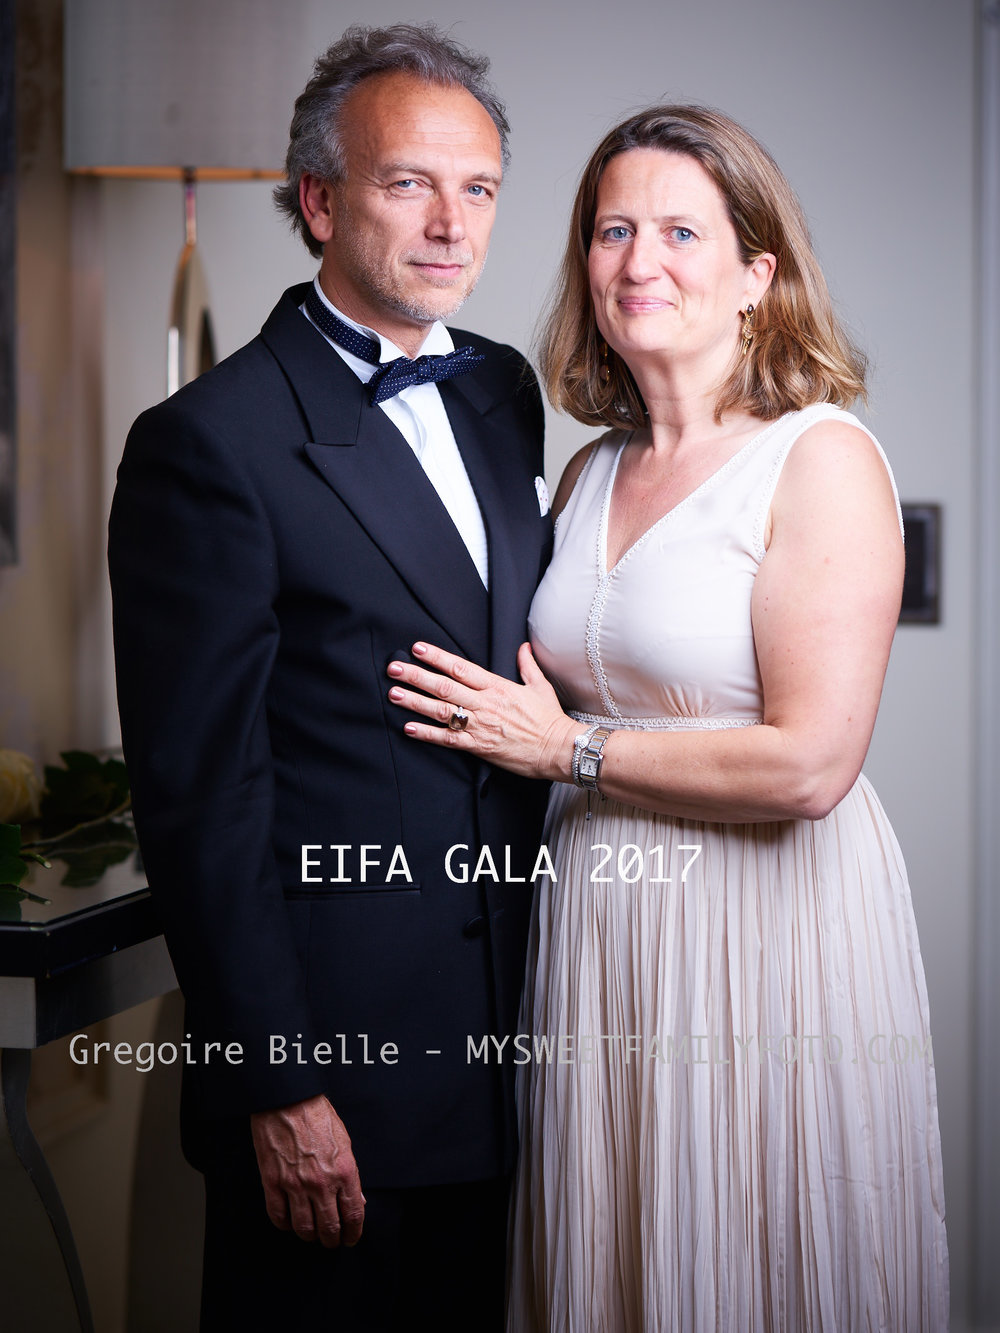 EIFA GALA 1311.jpg